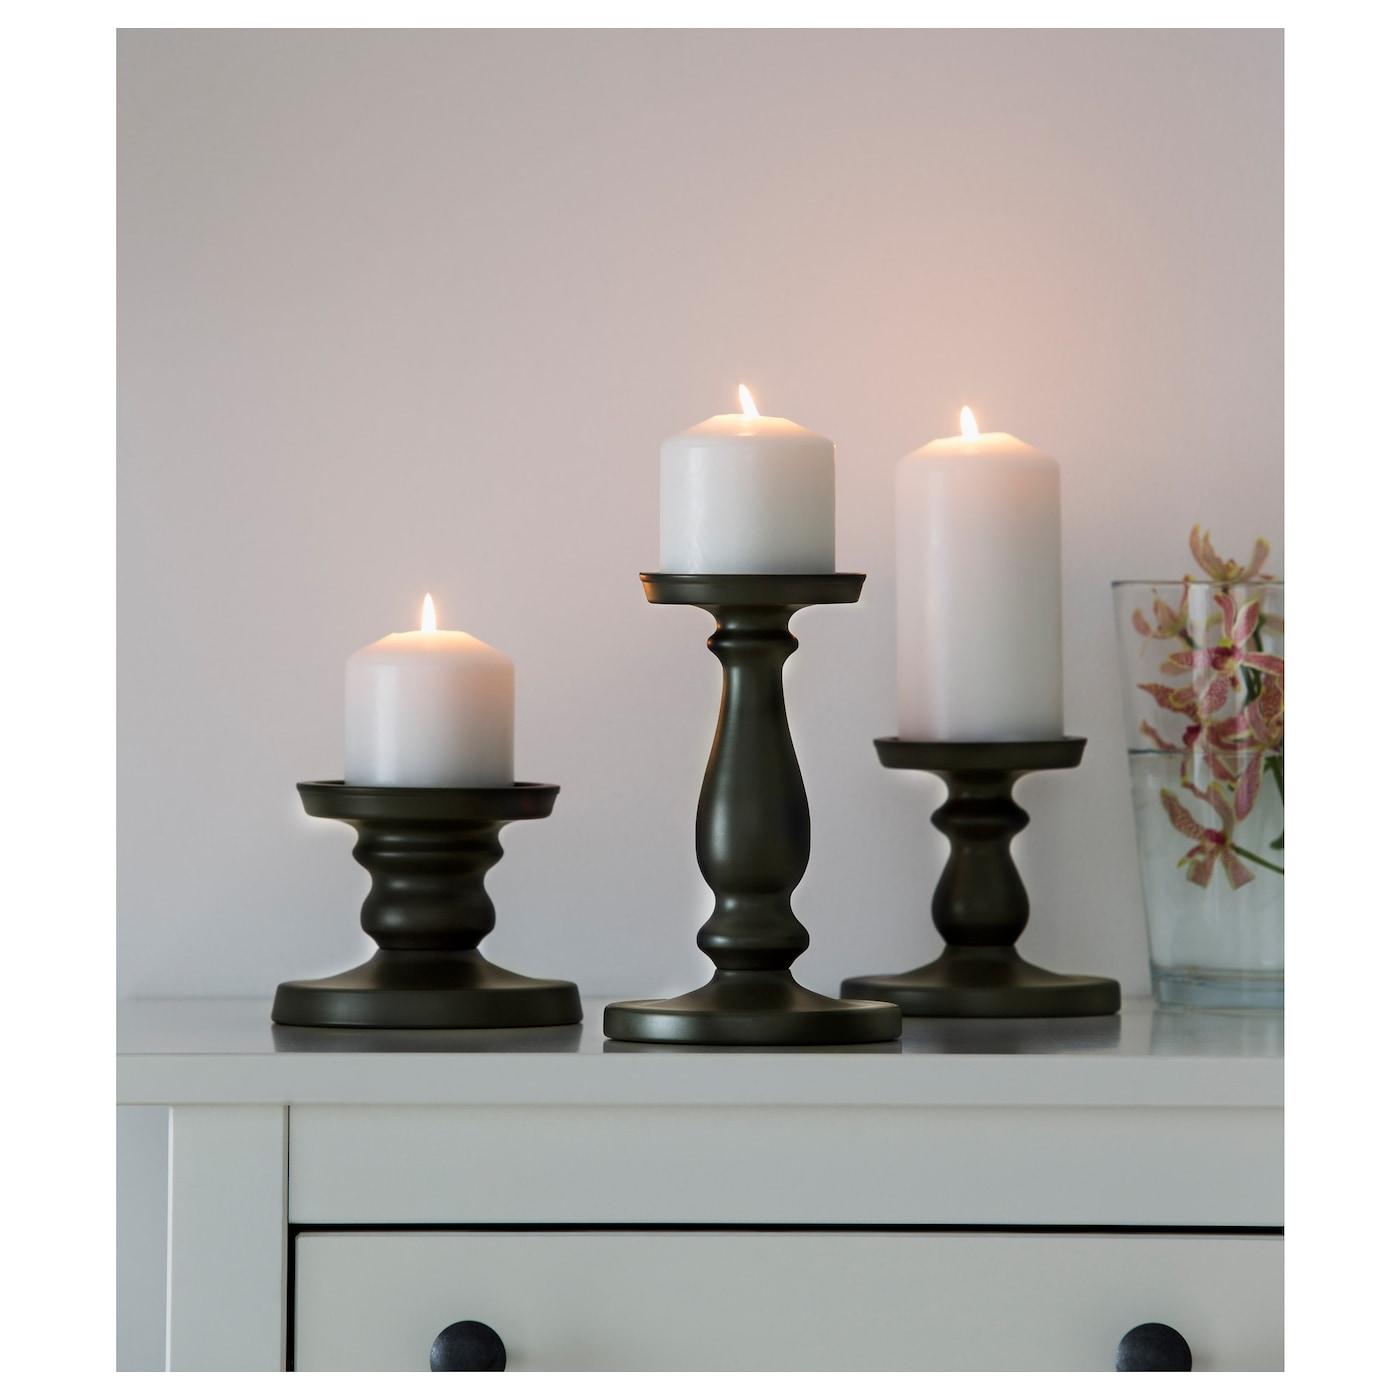 Ers tta block candle holder grey 21 cm ikea - Soportes para velas ...